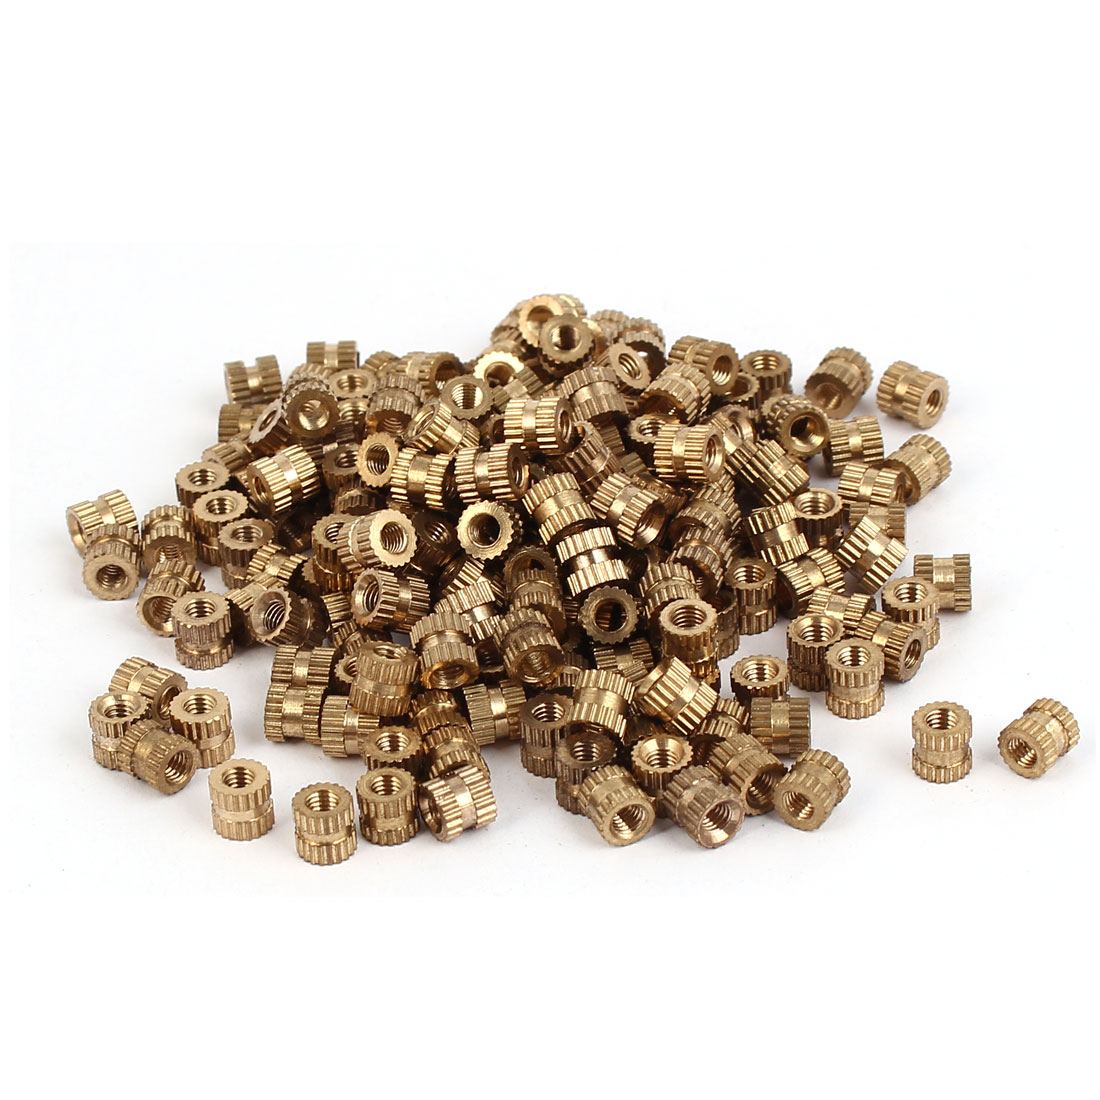 M3 x 5mm Female Thread Brass Knurled Threaded Round Insert Embedded Nuts 200PCS